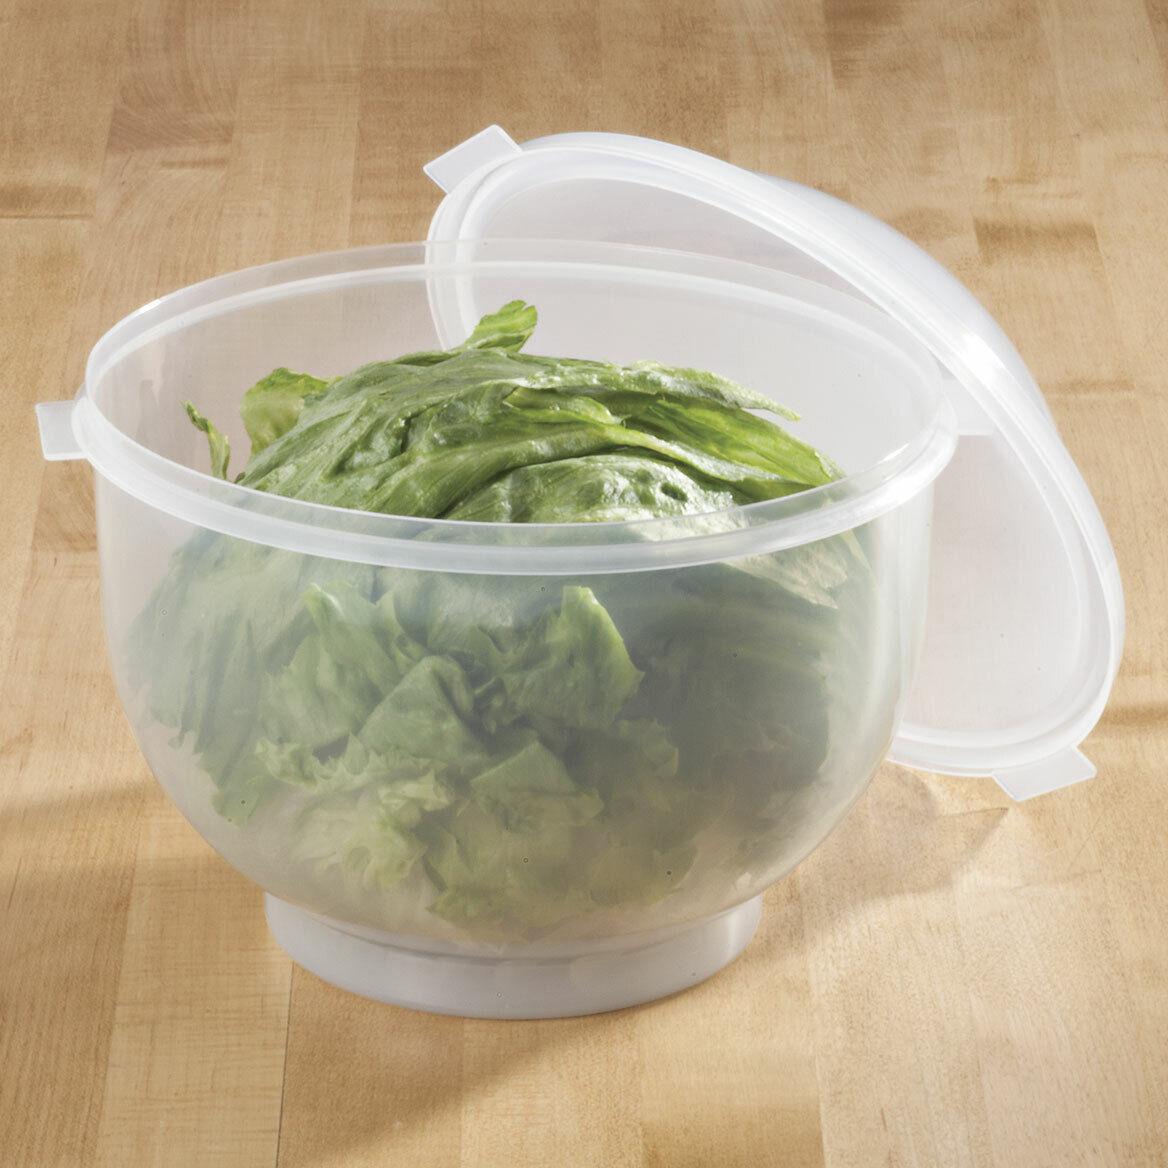 Lettuce Keeper, Kitchen & Tabletop, Food Storage, Dishwasher Safe, Free Shipping